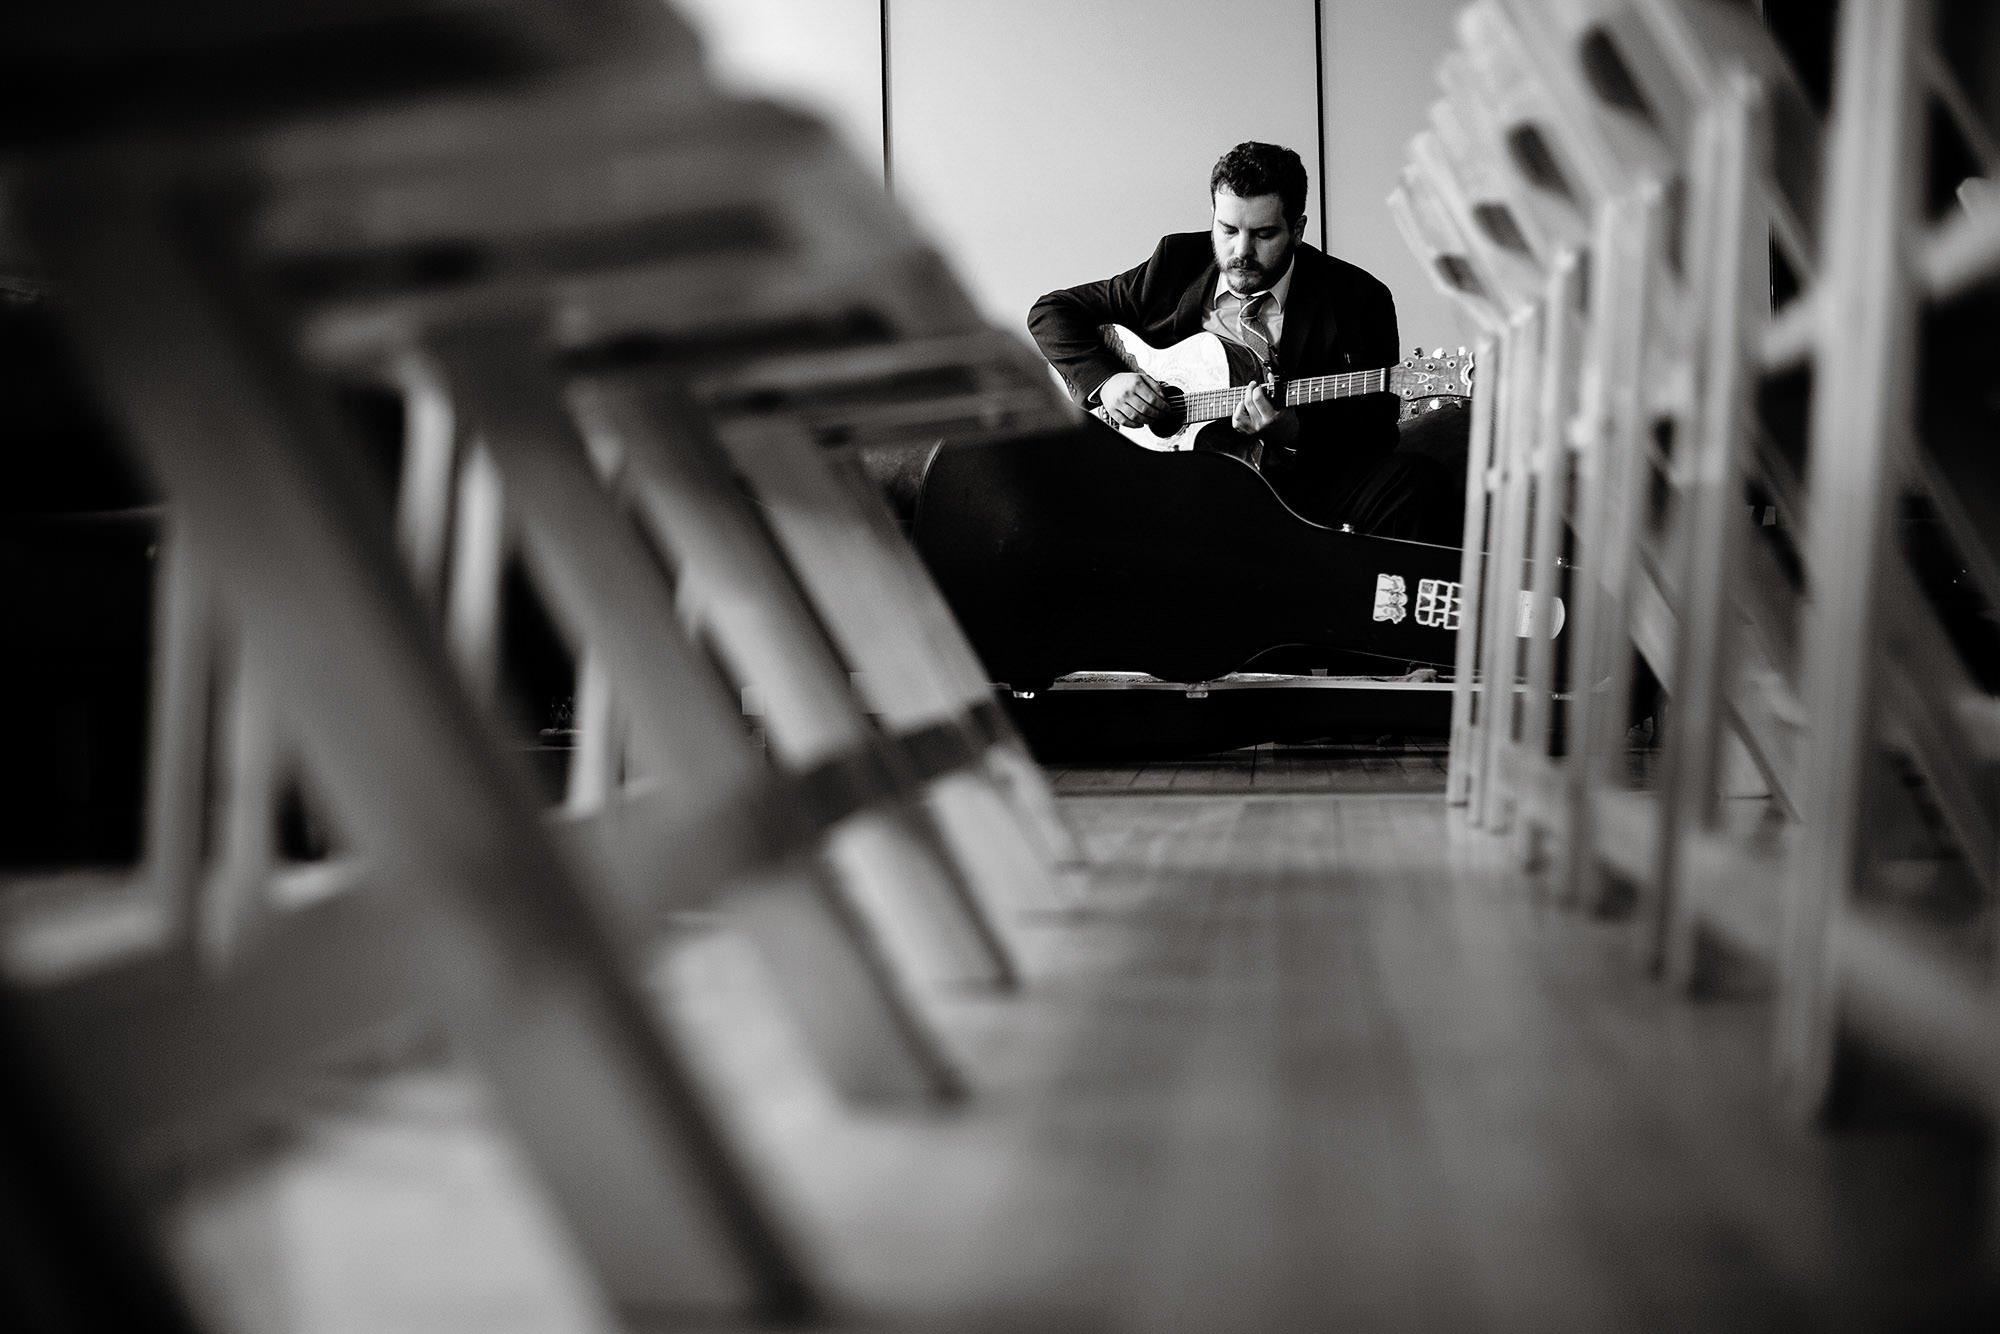 Loft at 600 F Wedding  I  A guitarist prepares for the wedding ceremony in Washington, DC.